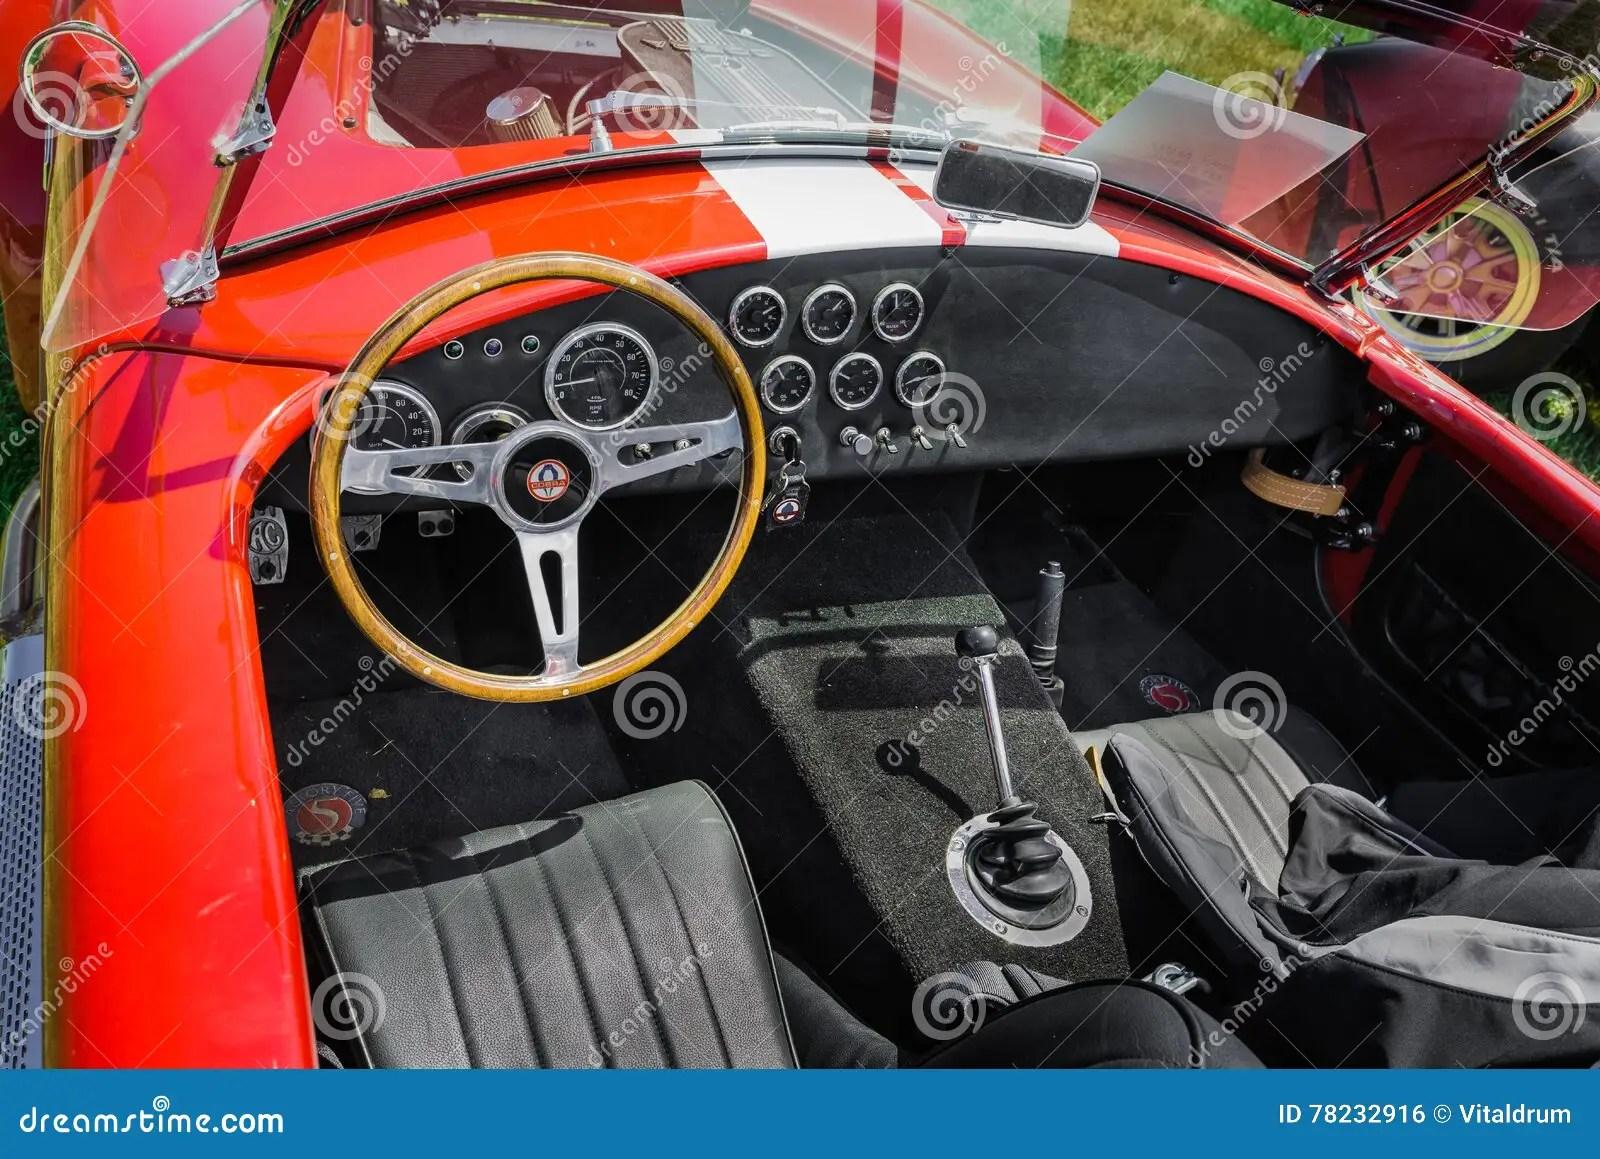 Nice Amazing Closeup View Of Classic Vintage Sport Car